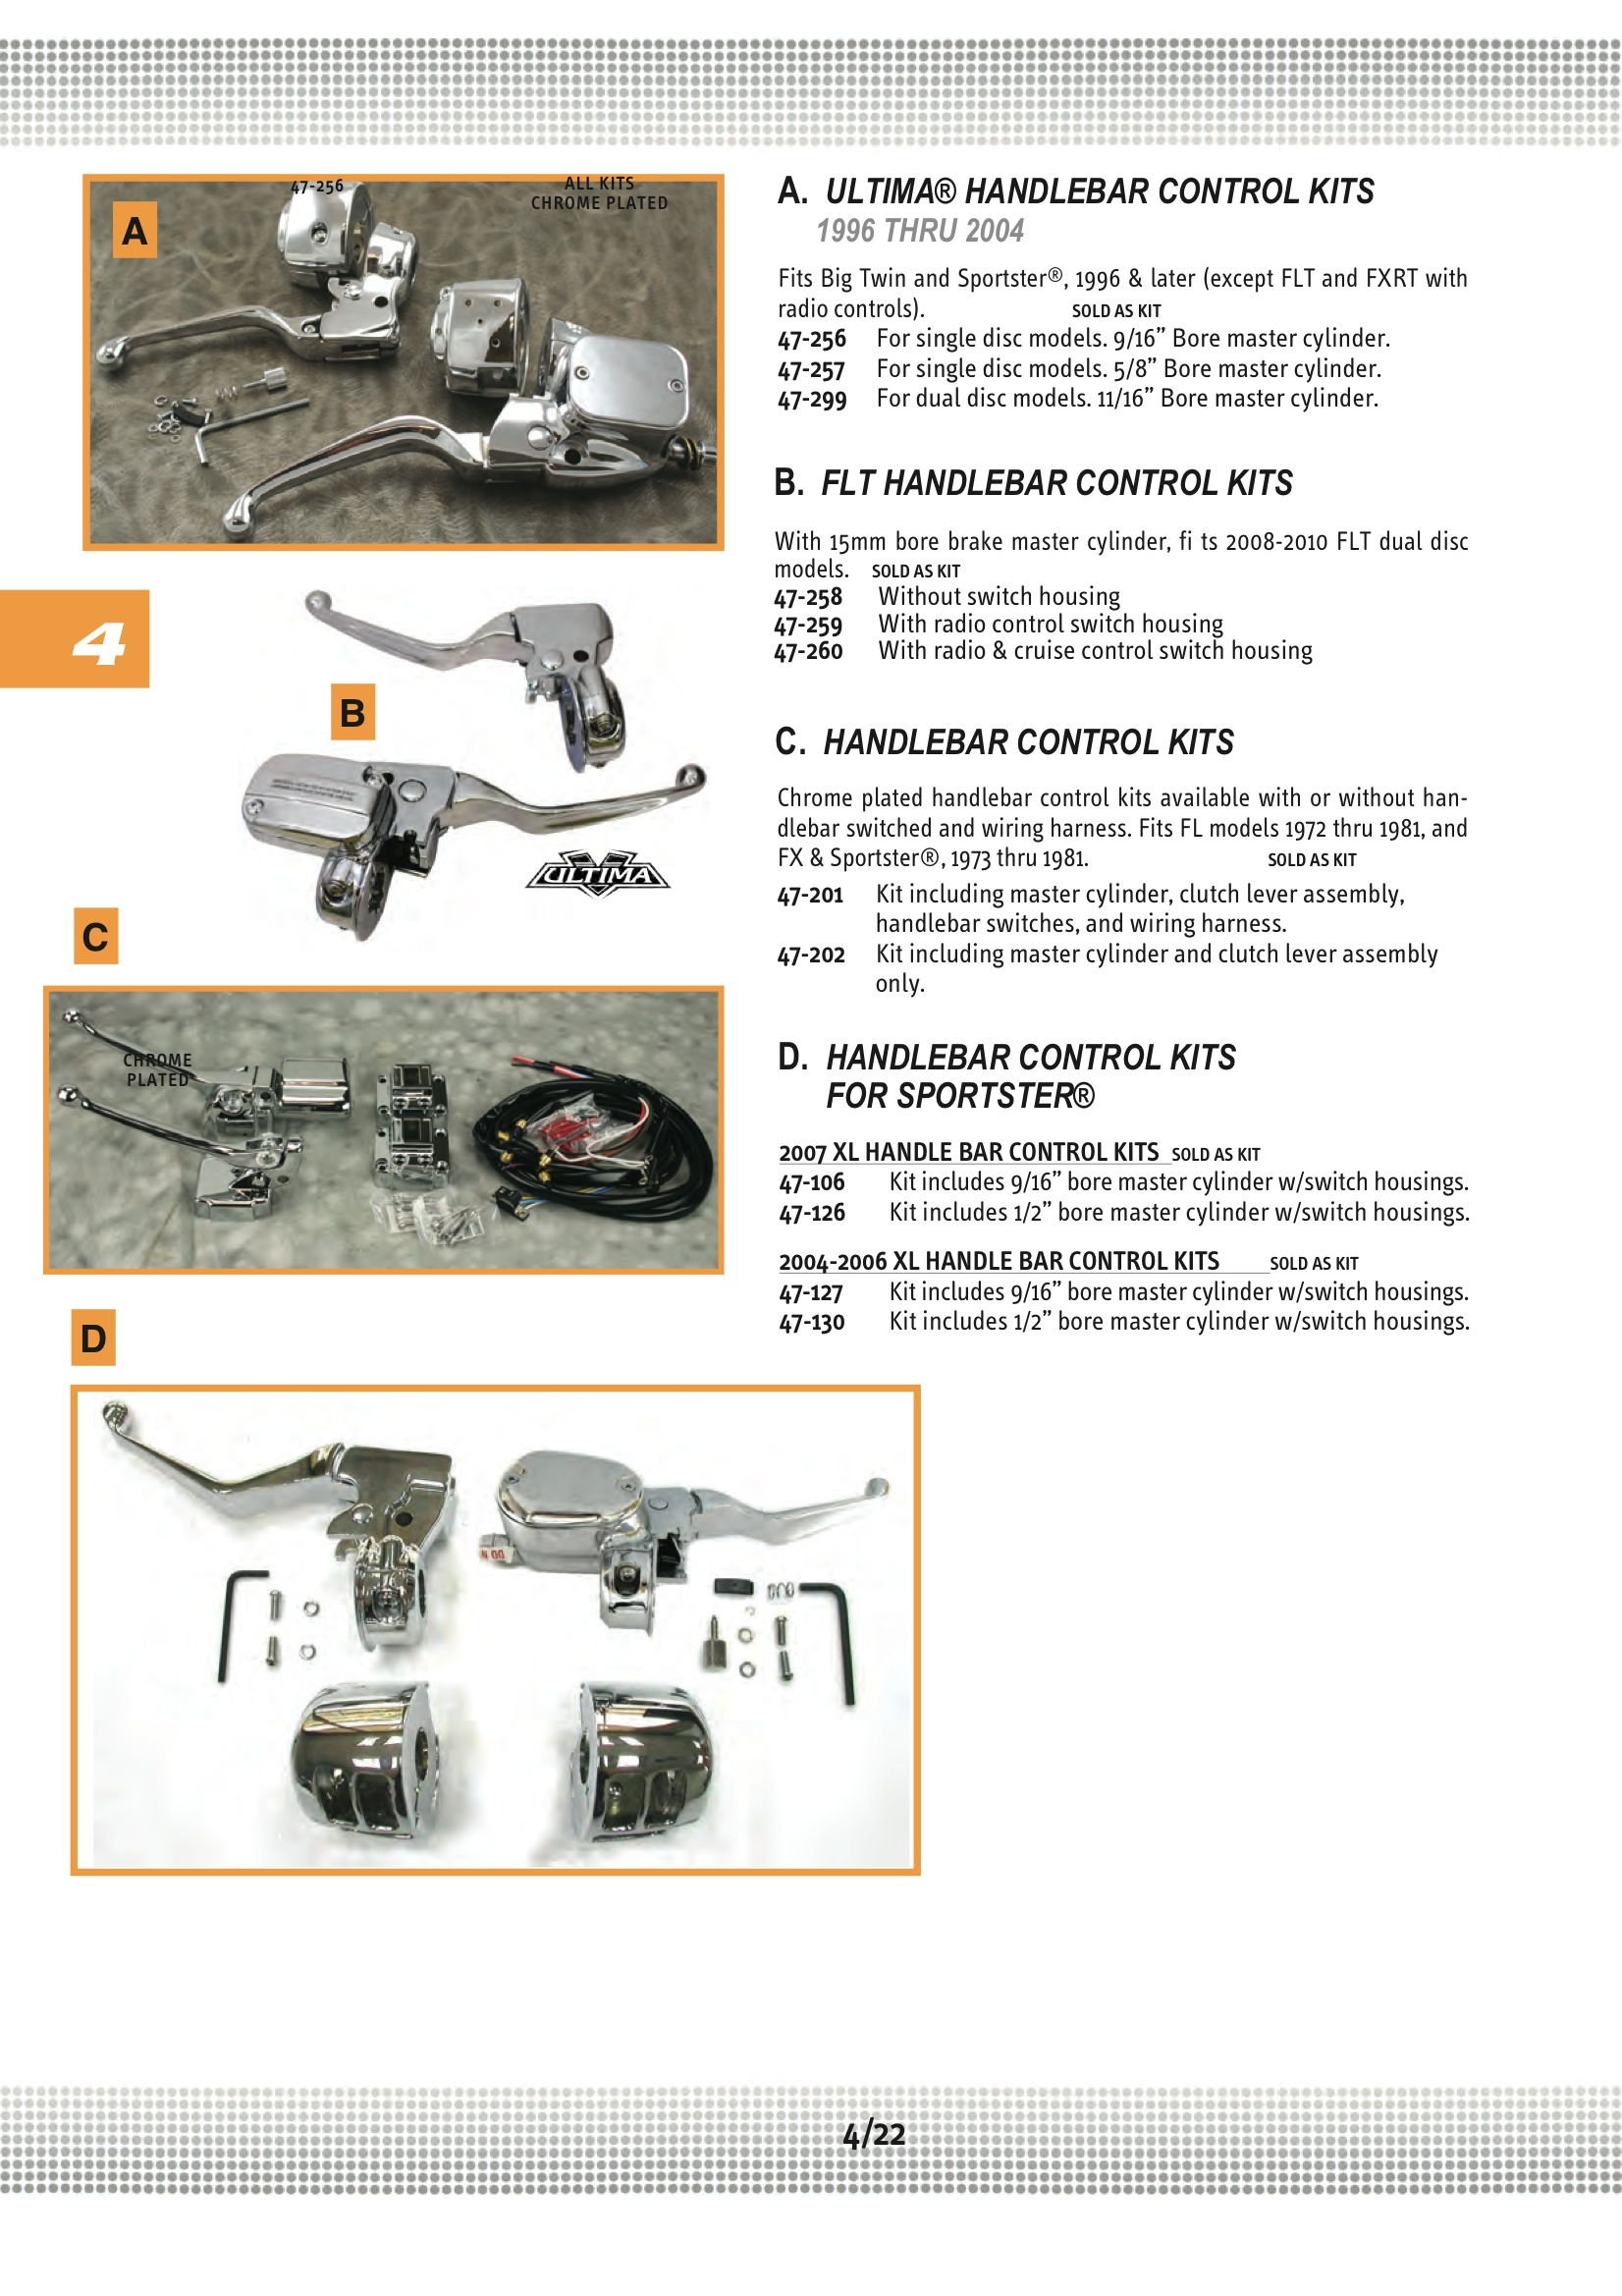 Ultima Handlebar Ctrl Kit 9 16in Bore 07 Midwest 47 106 Harley Davidson Switch Motorcycle